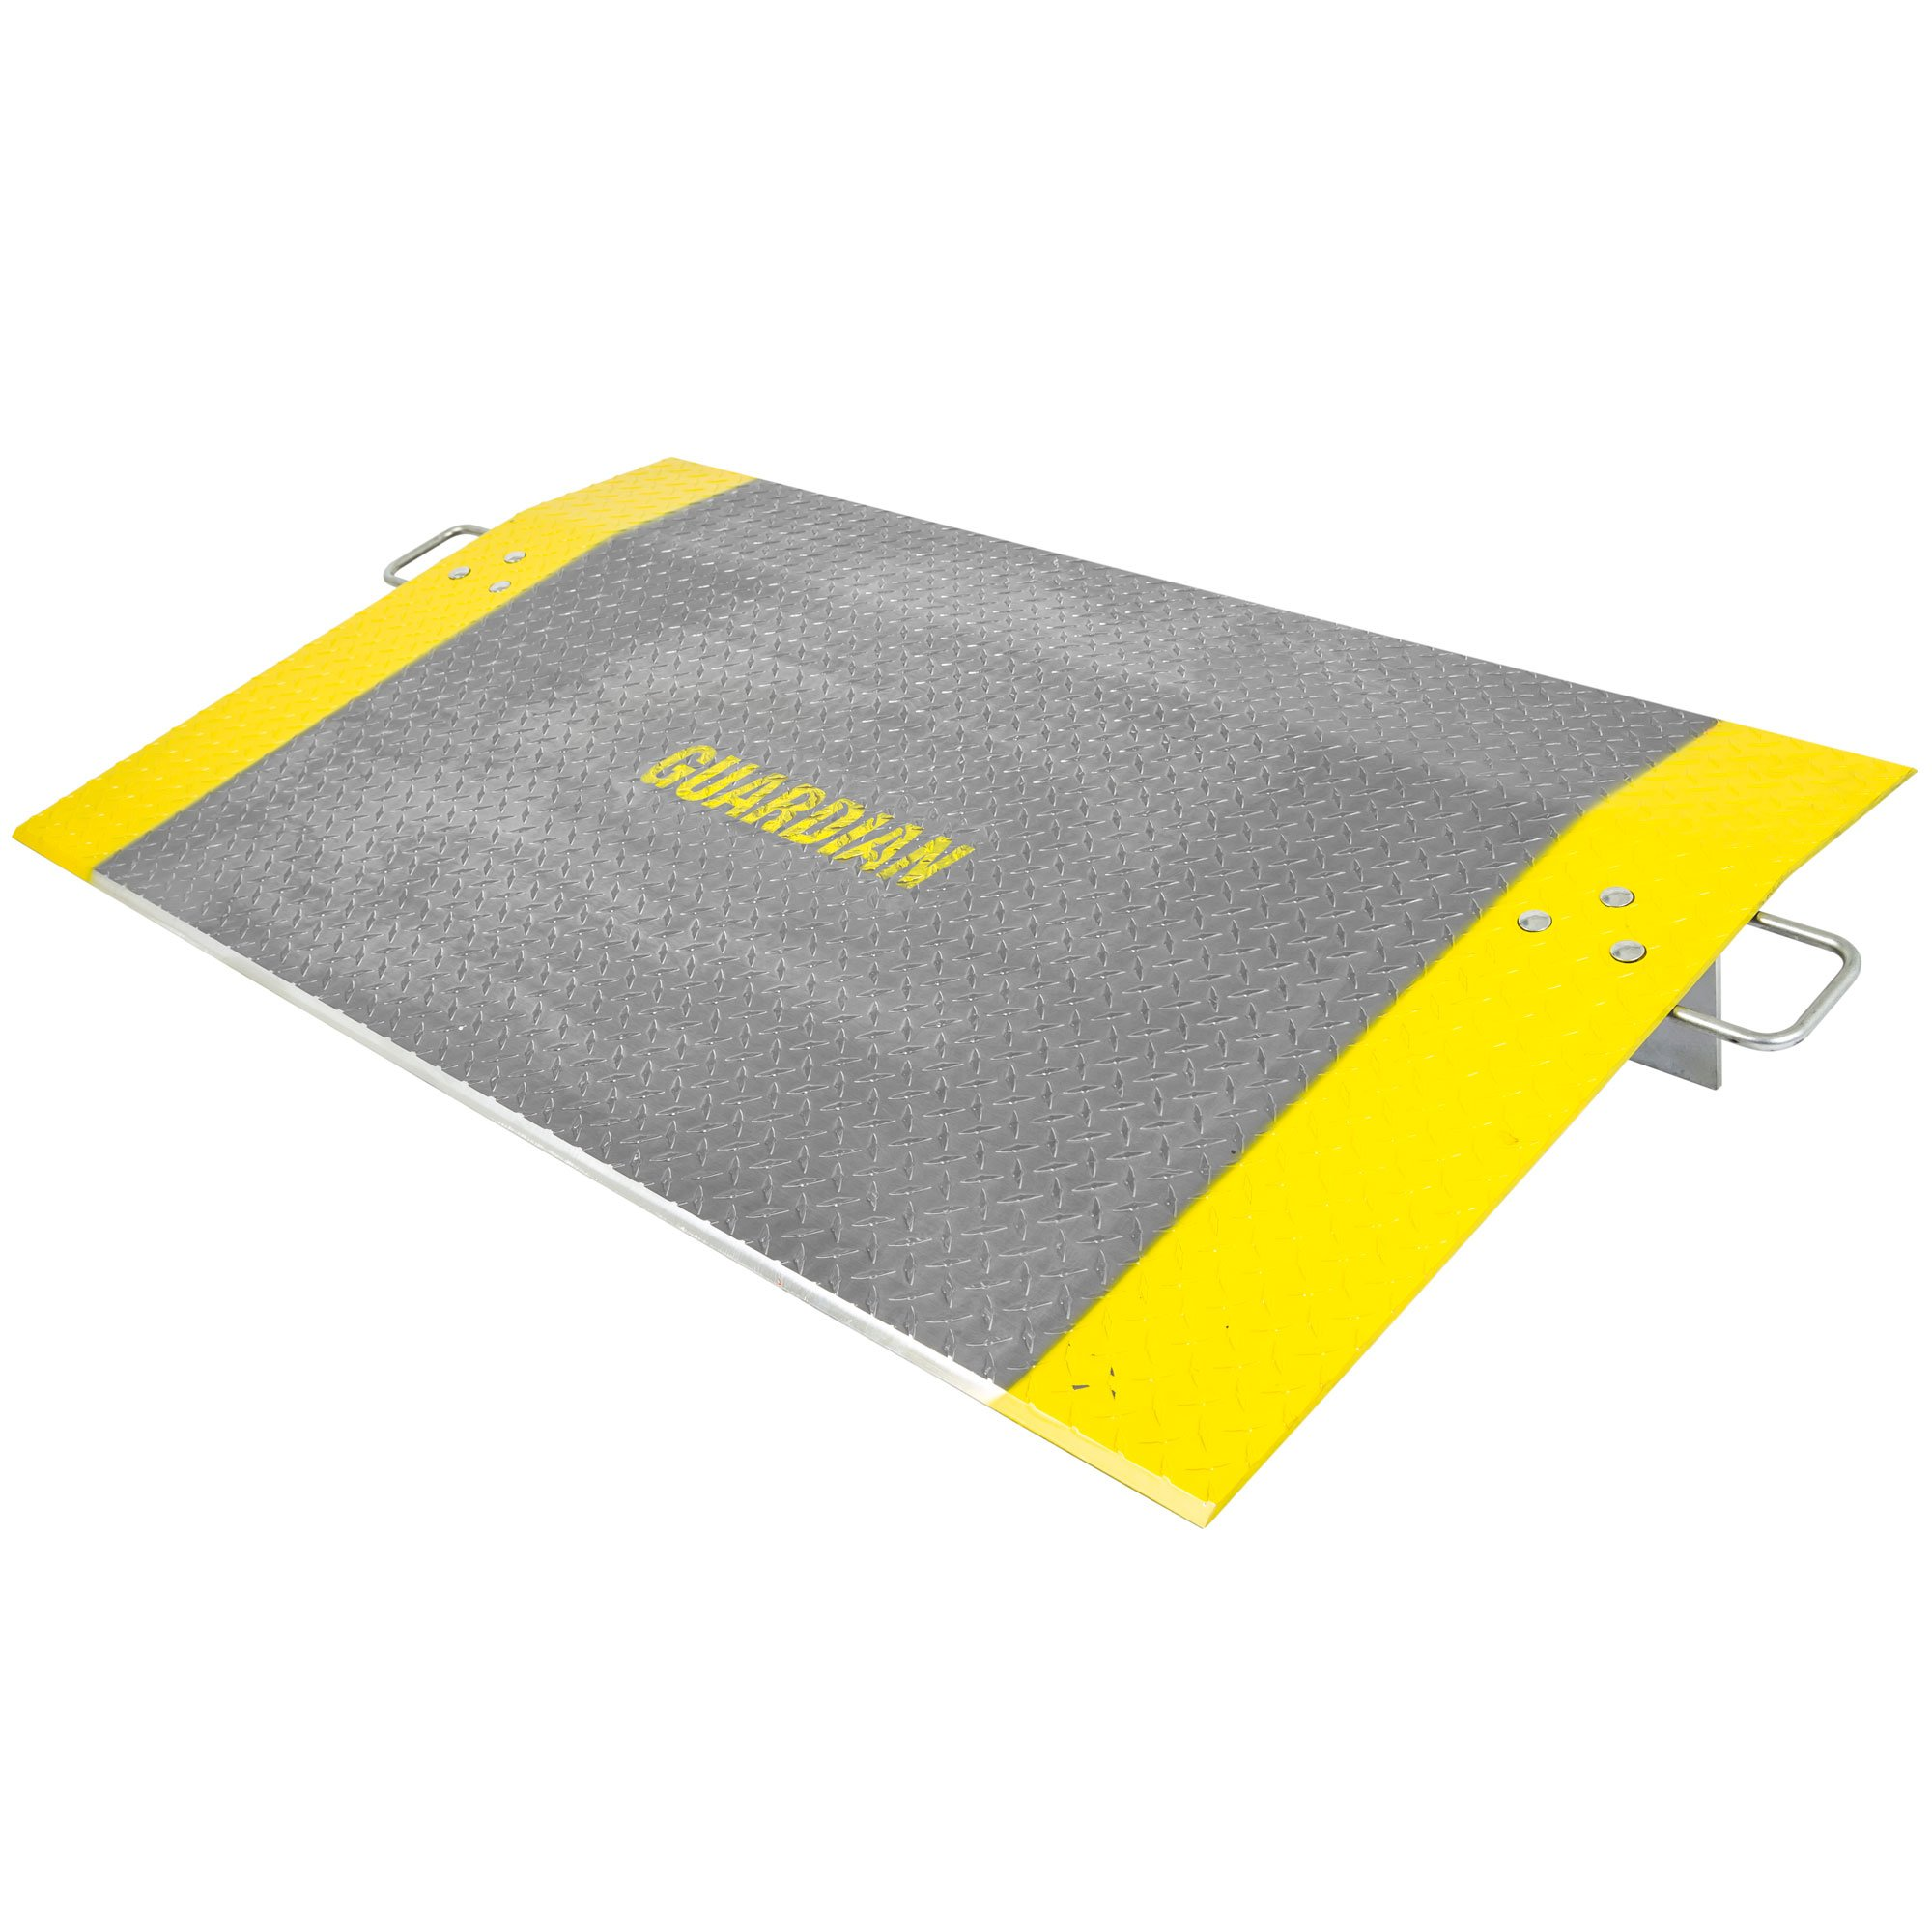 60'' x 36'' Aluminum 4,100 lb Pallet Jack Loading Dock Plate